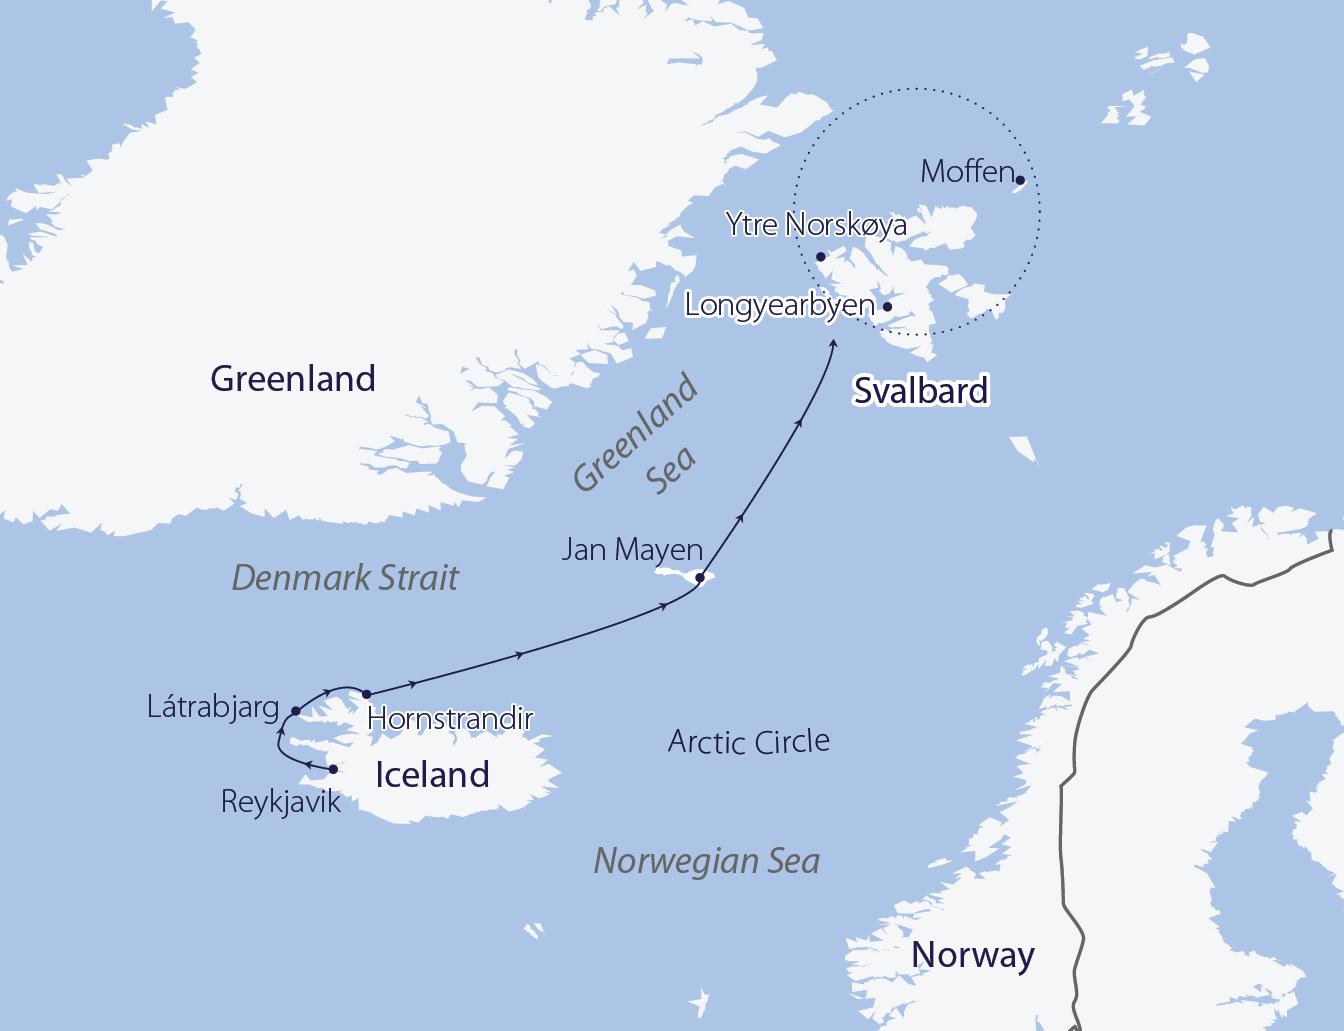 Map for Iceland, Jan Mayen and Svalbard (Greg Mortimer)